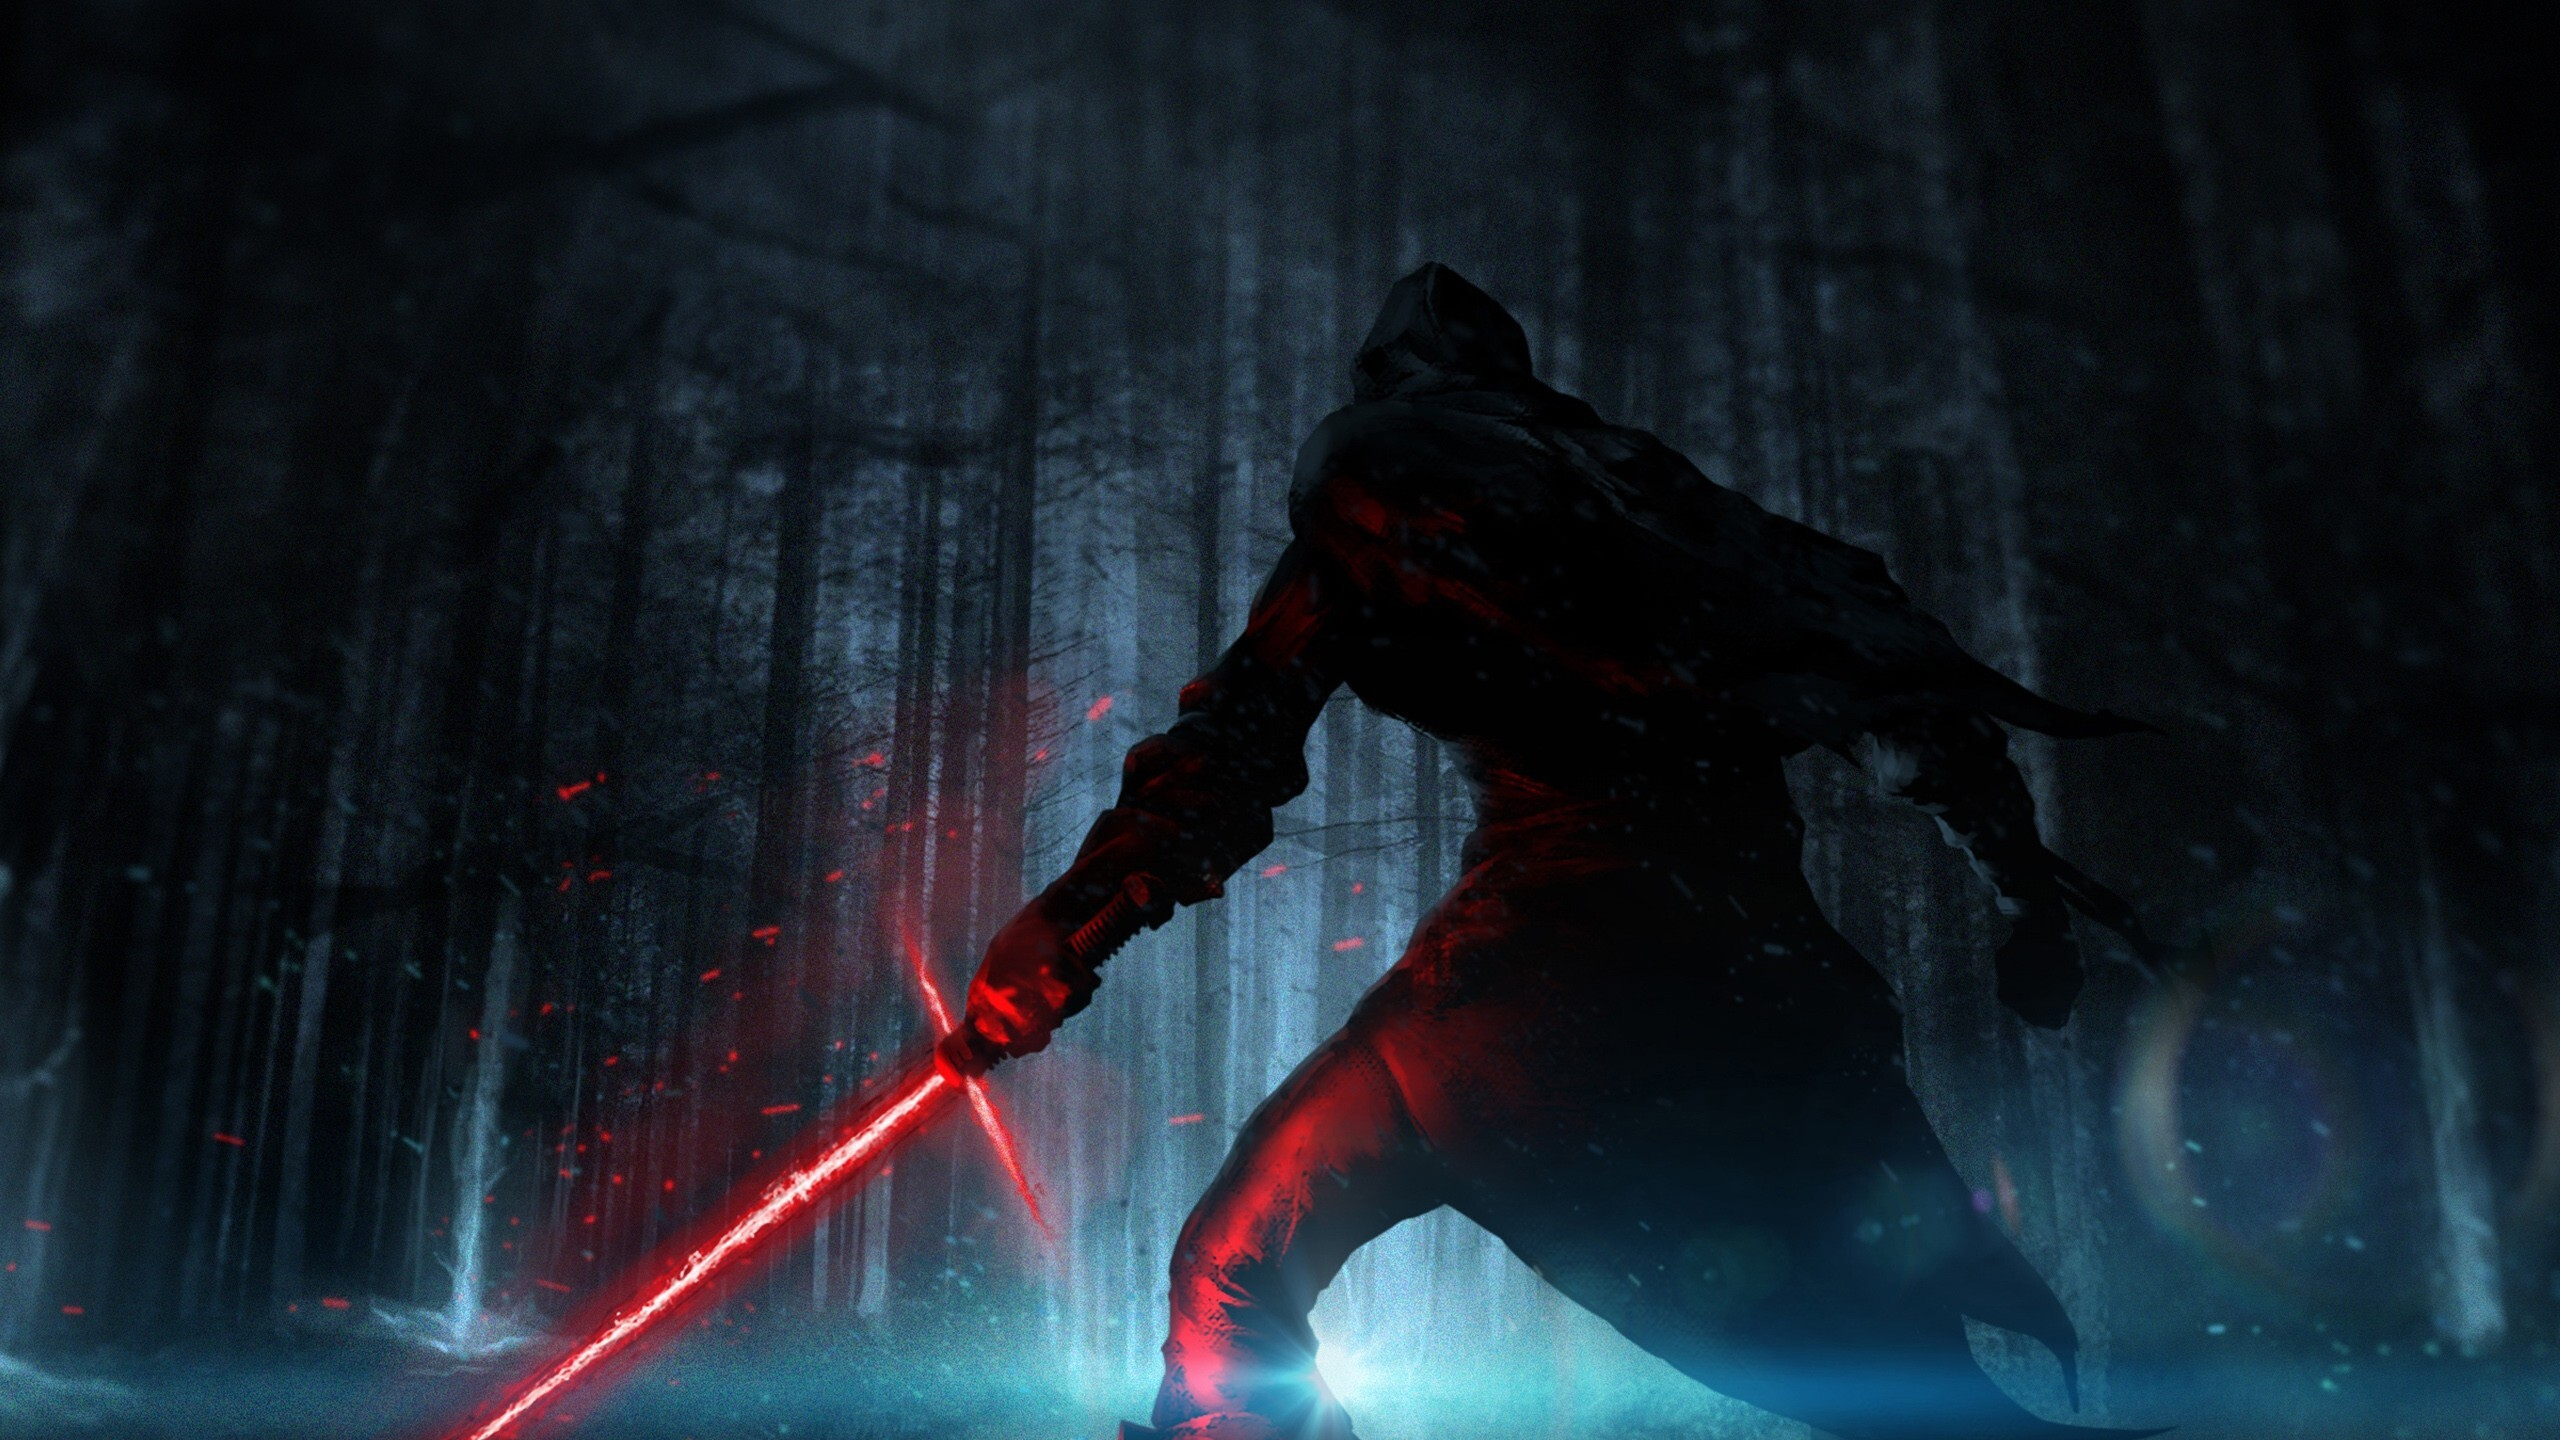 2560x1440 Star Wars Ep7 The Force Awakens 2 Hd 1440p Resolution Hd